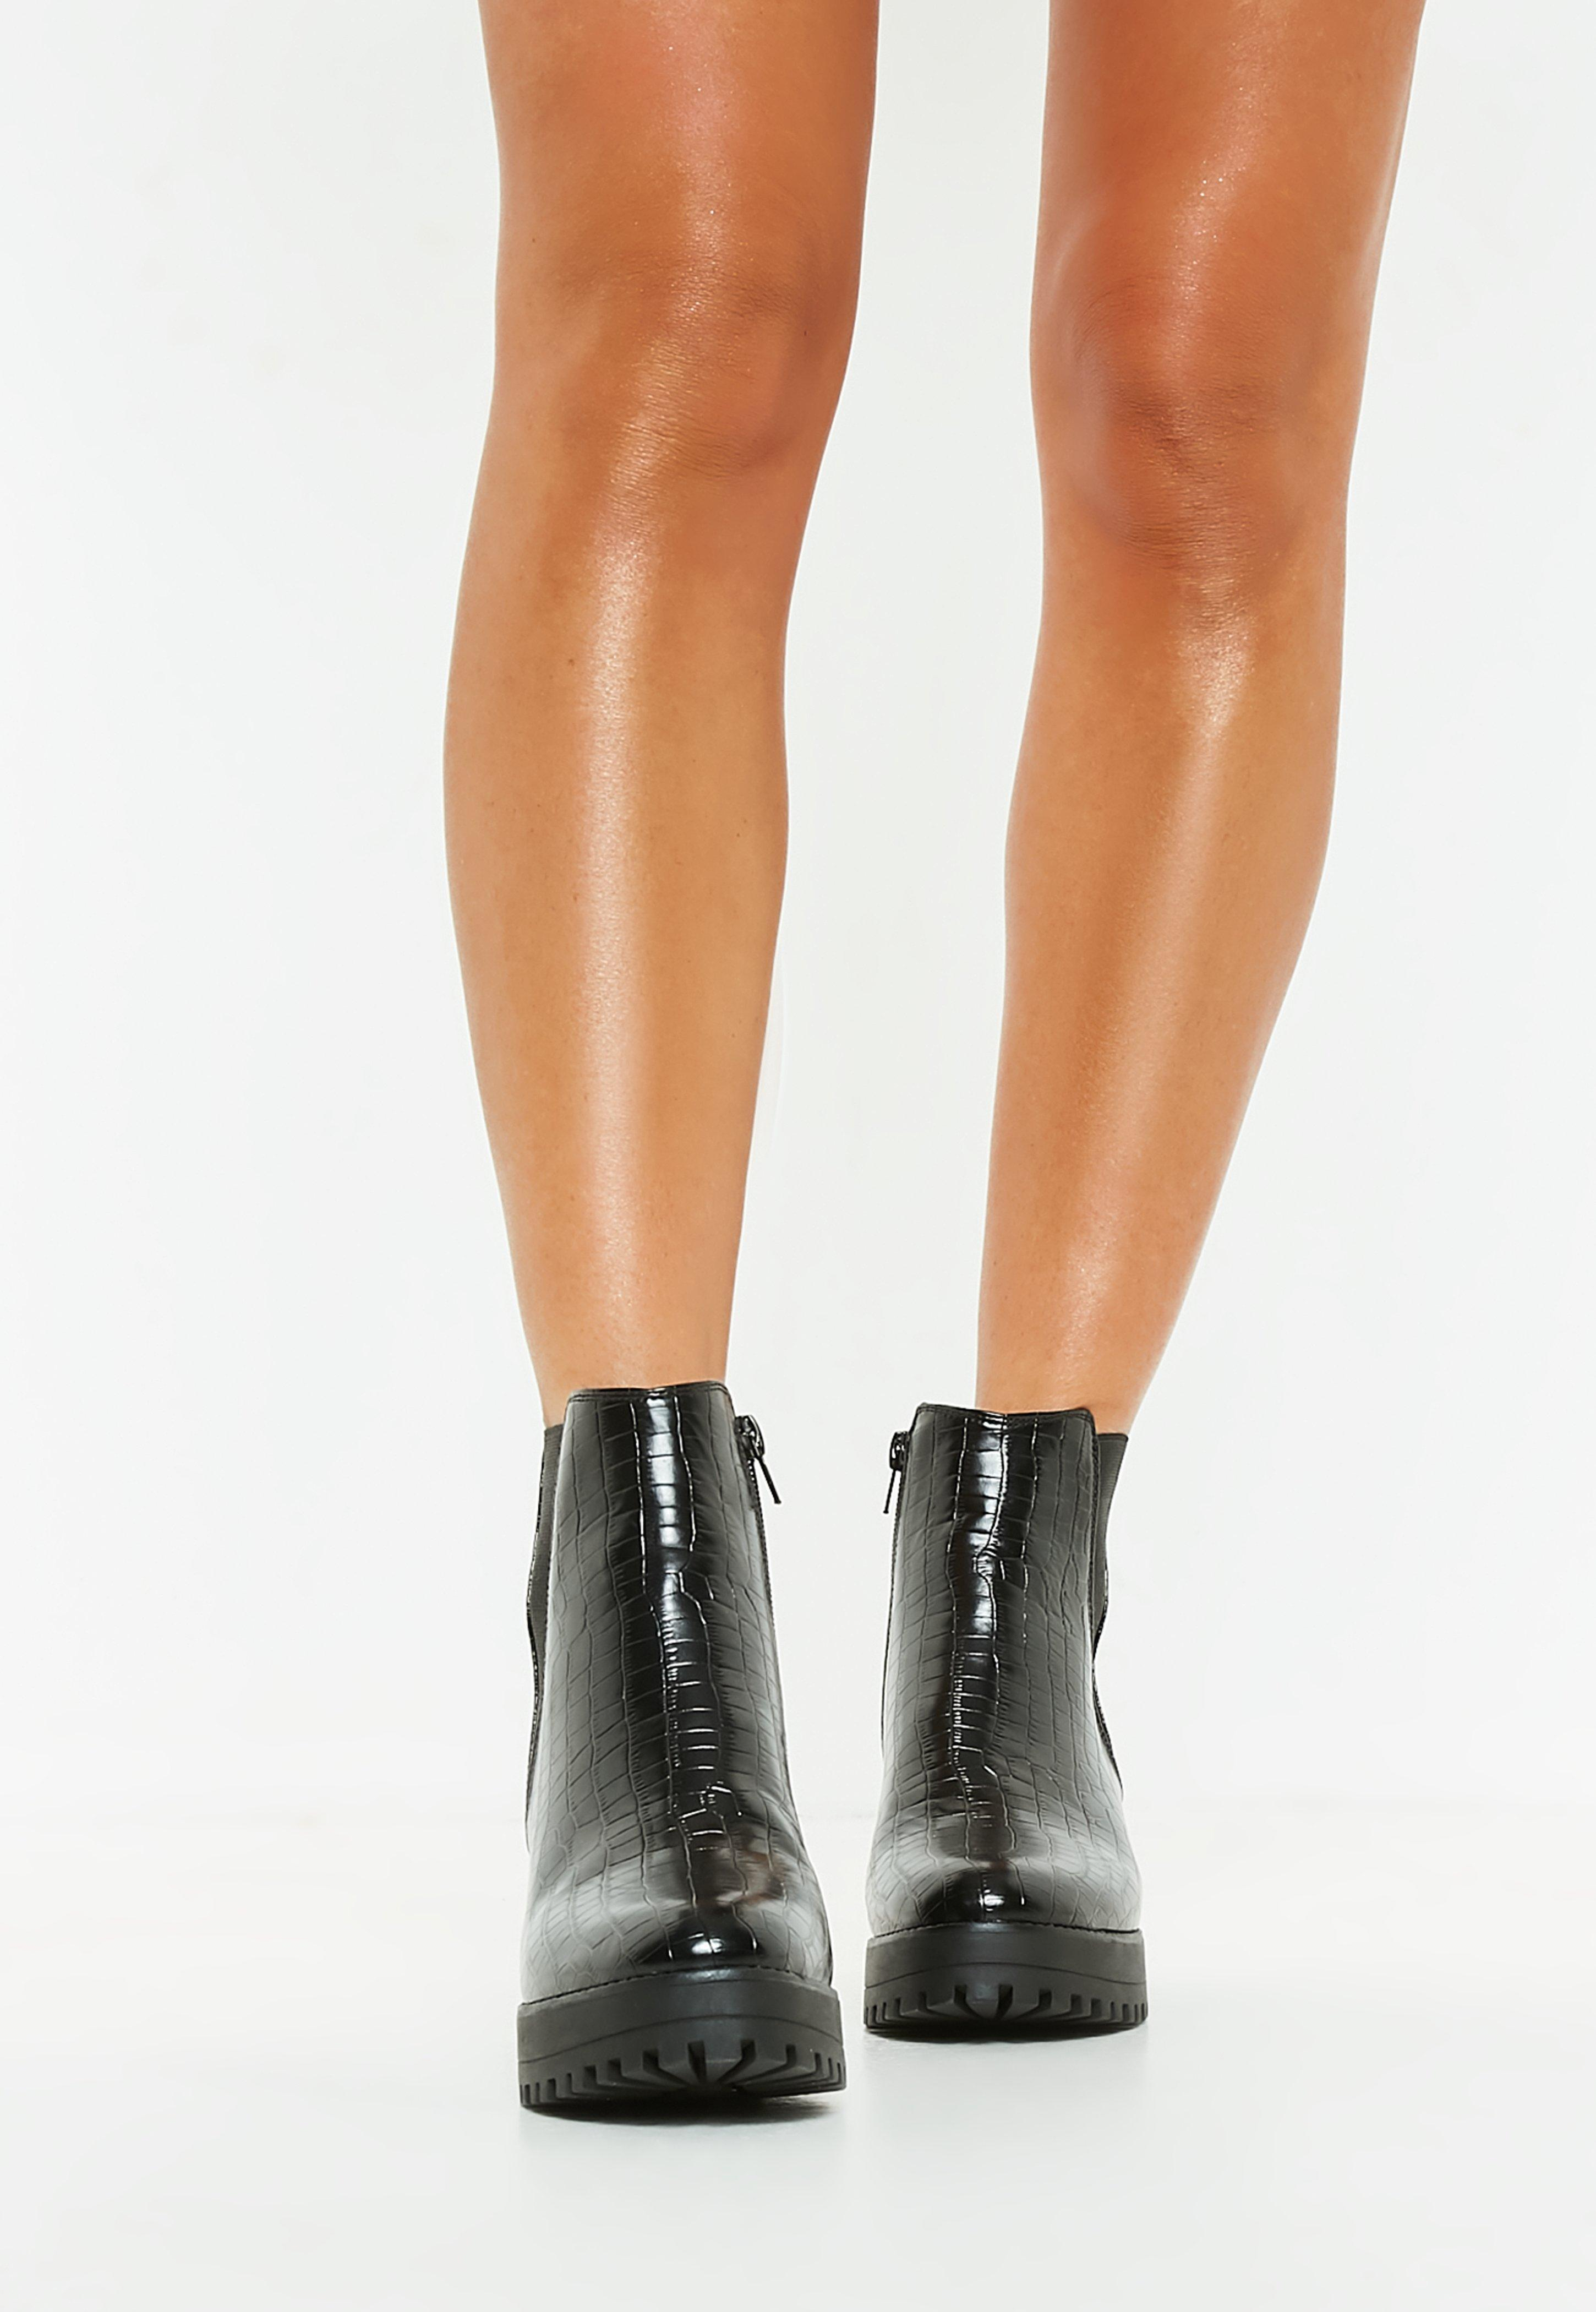 b2ff0afc79b6 Missguided - Black Croc Chunky Chelsea Ankle Boot - Lyst. View fullscreen